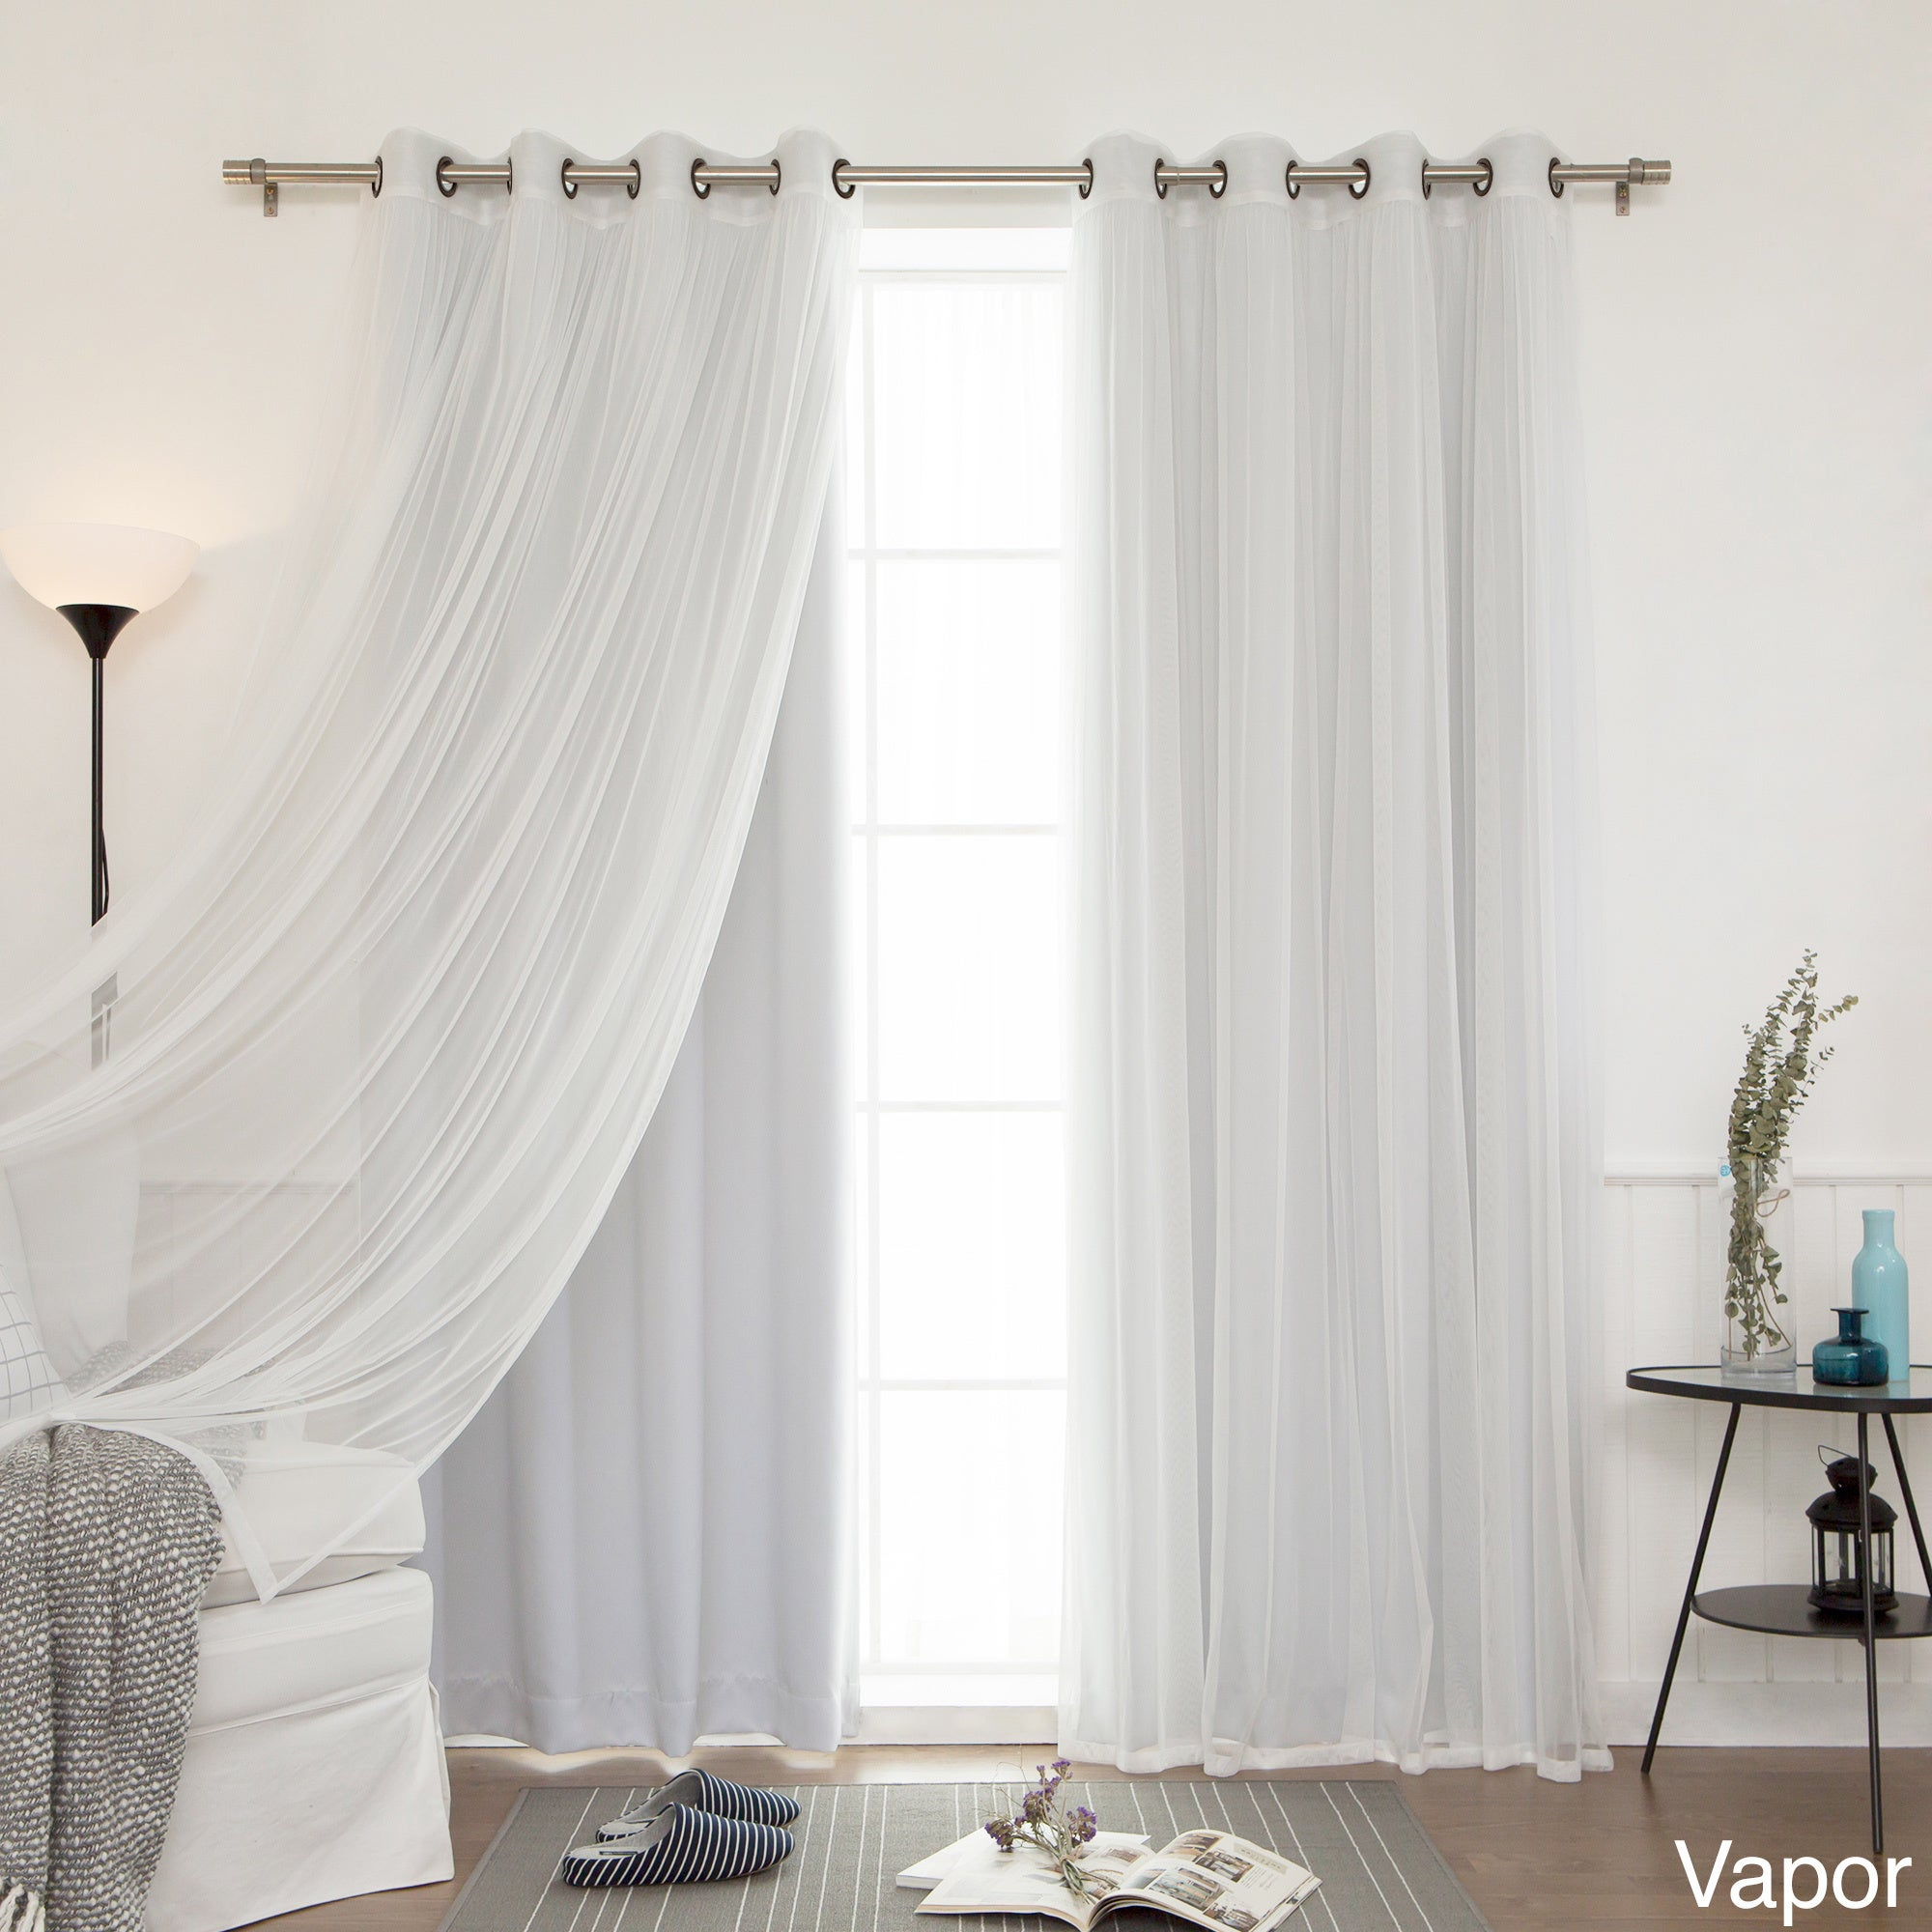 curtains national harper prod grommet p pair hei qlt window sheer wid panel